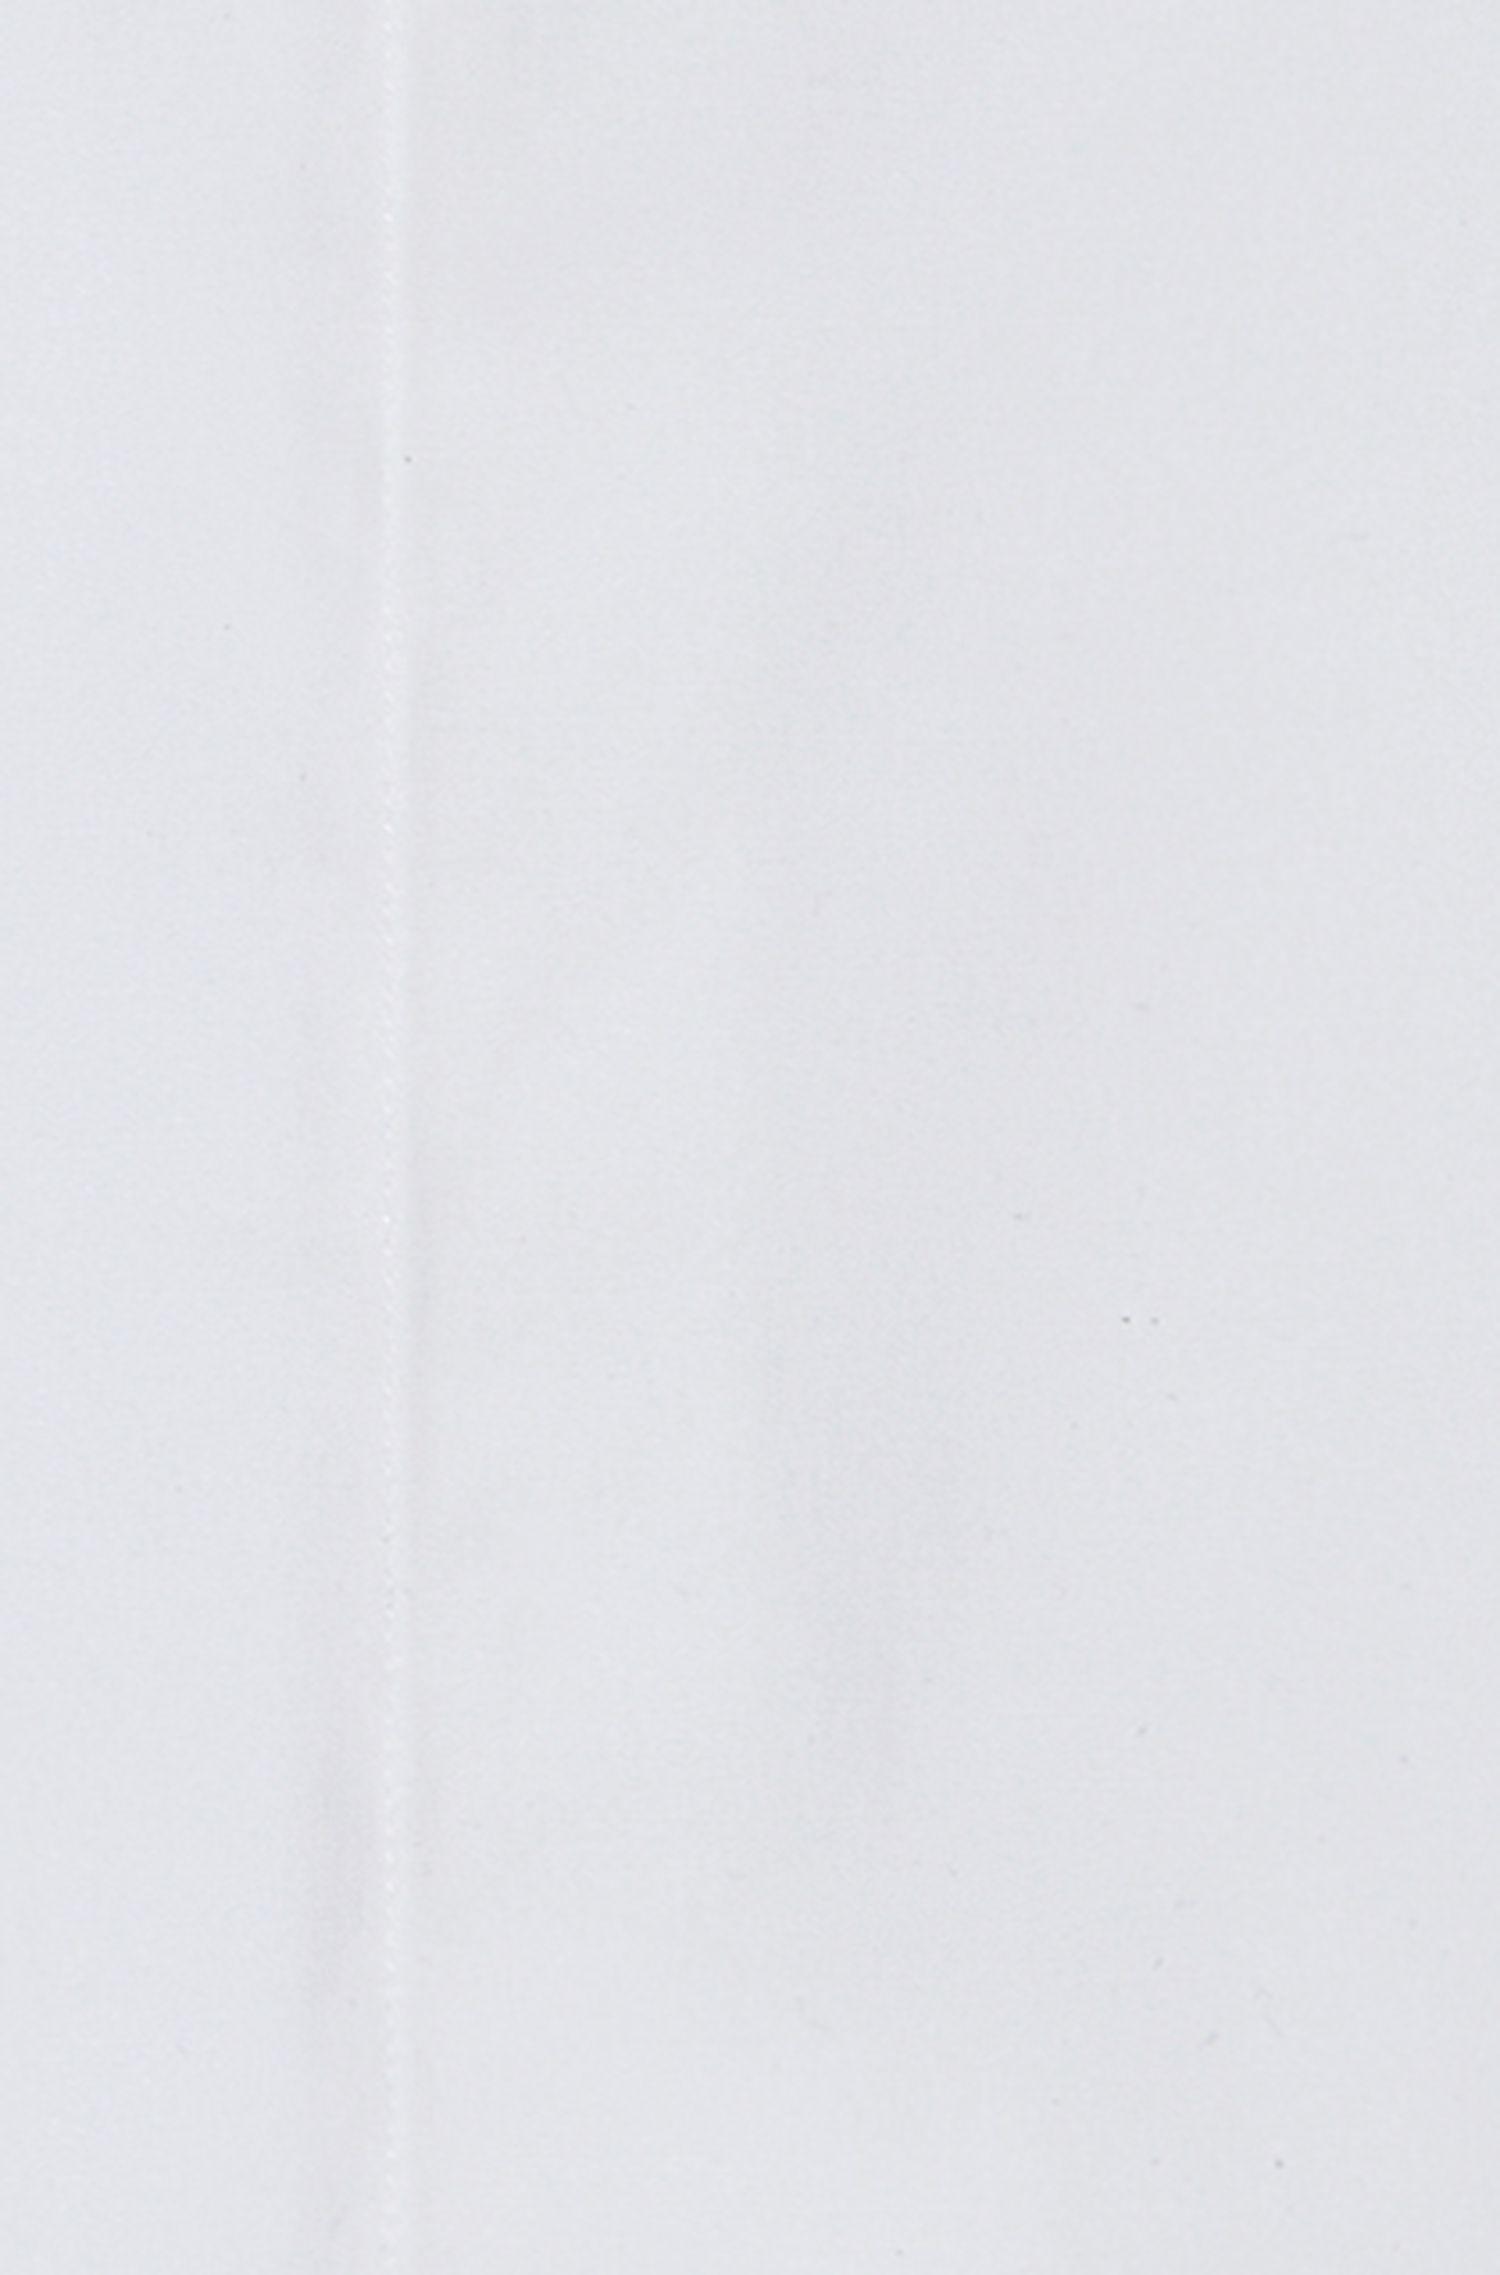 Point Collar Stretch Cotton French Cuff Dress Shirt, Slim Fit | EveningX